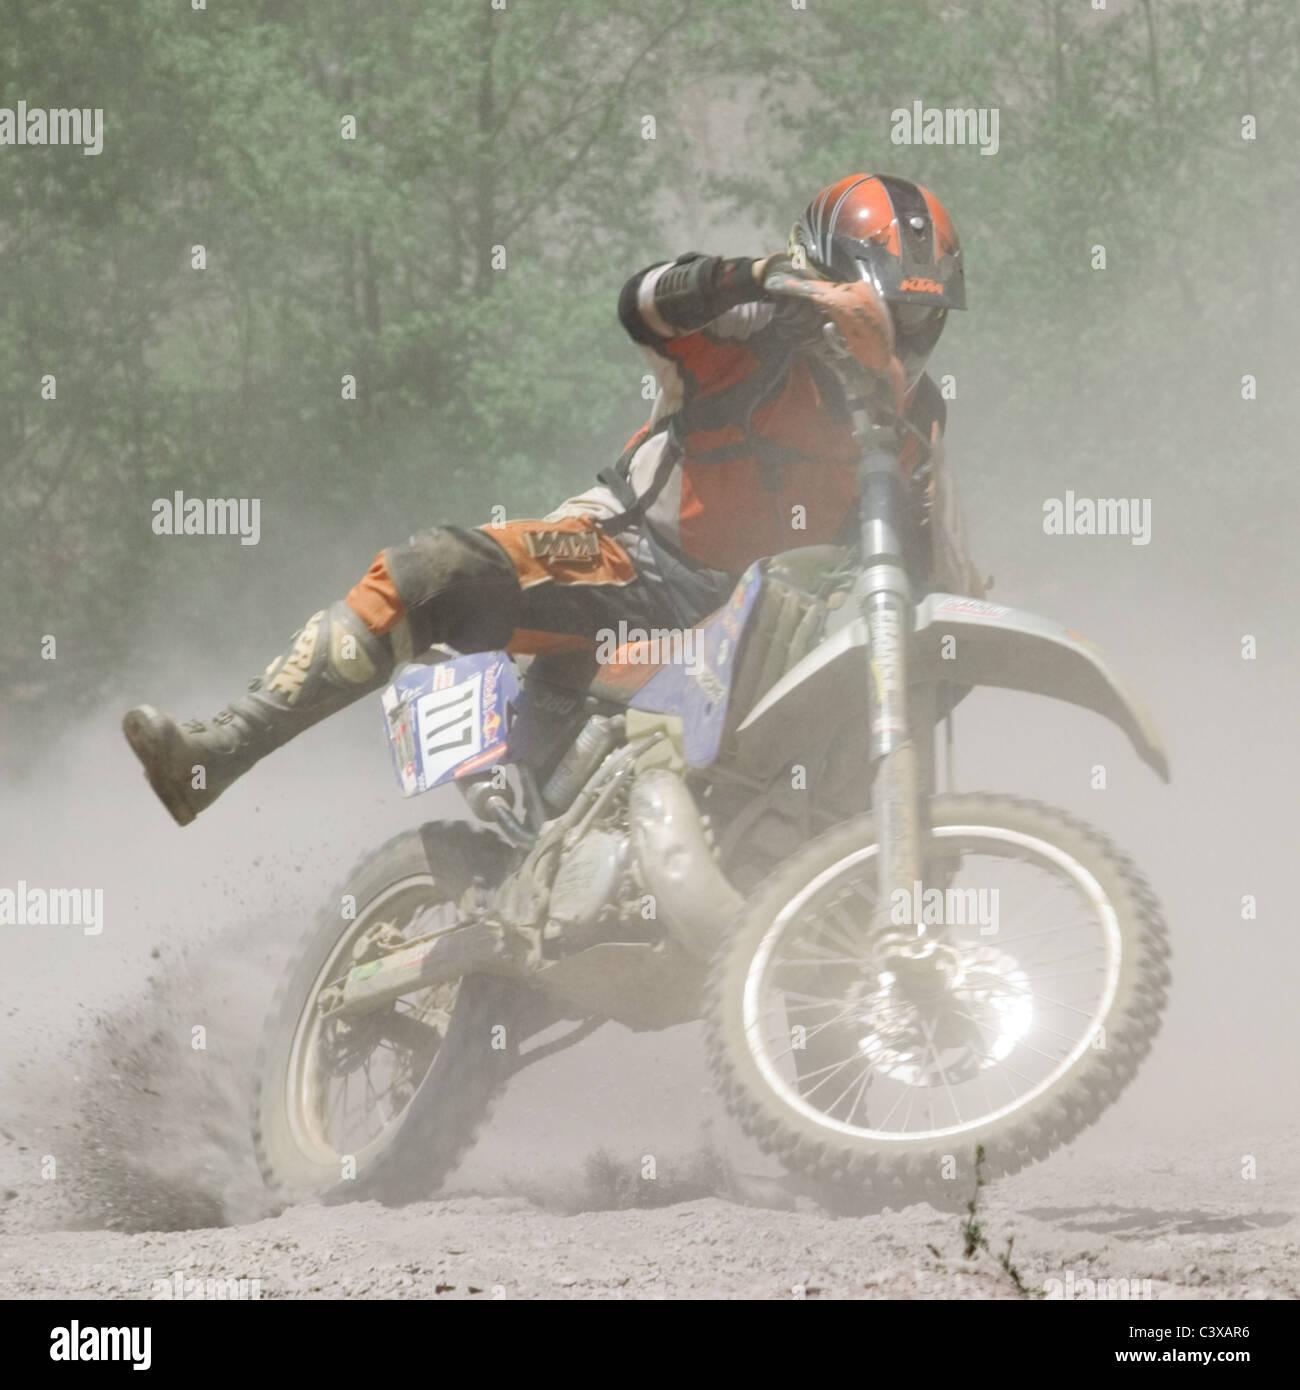 Motocross - Stock Image